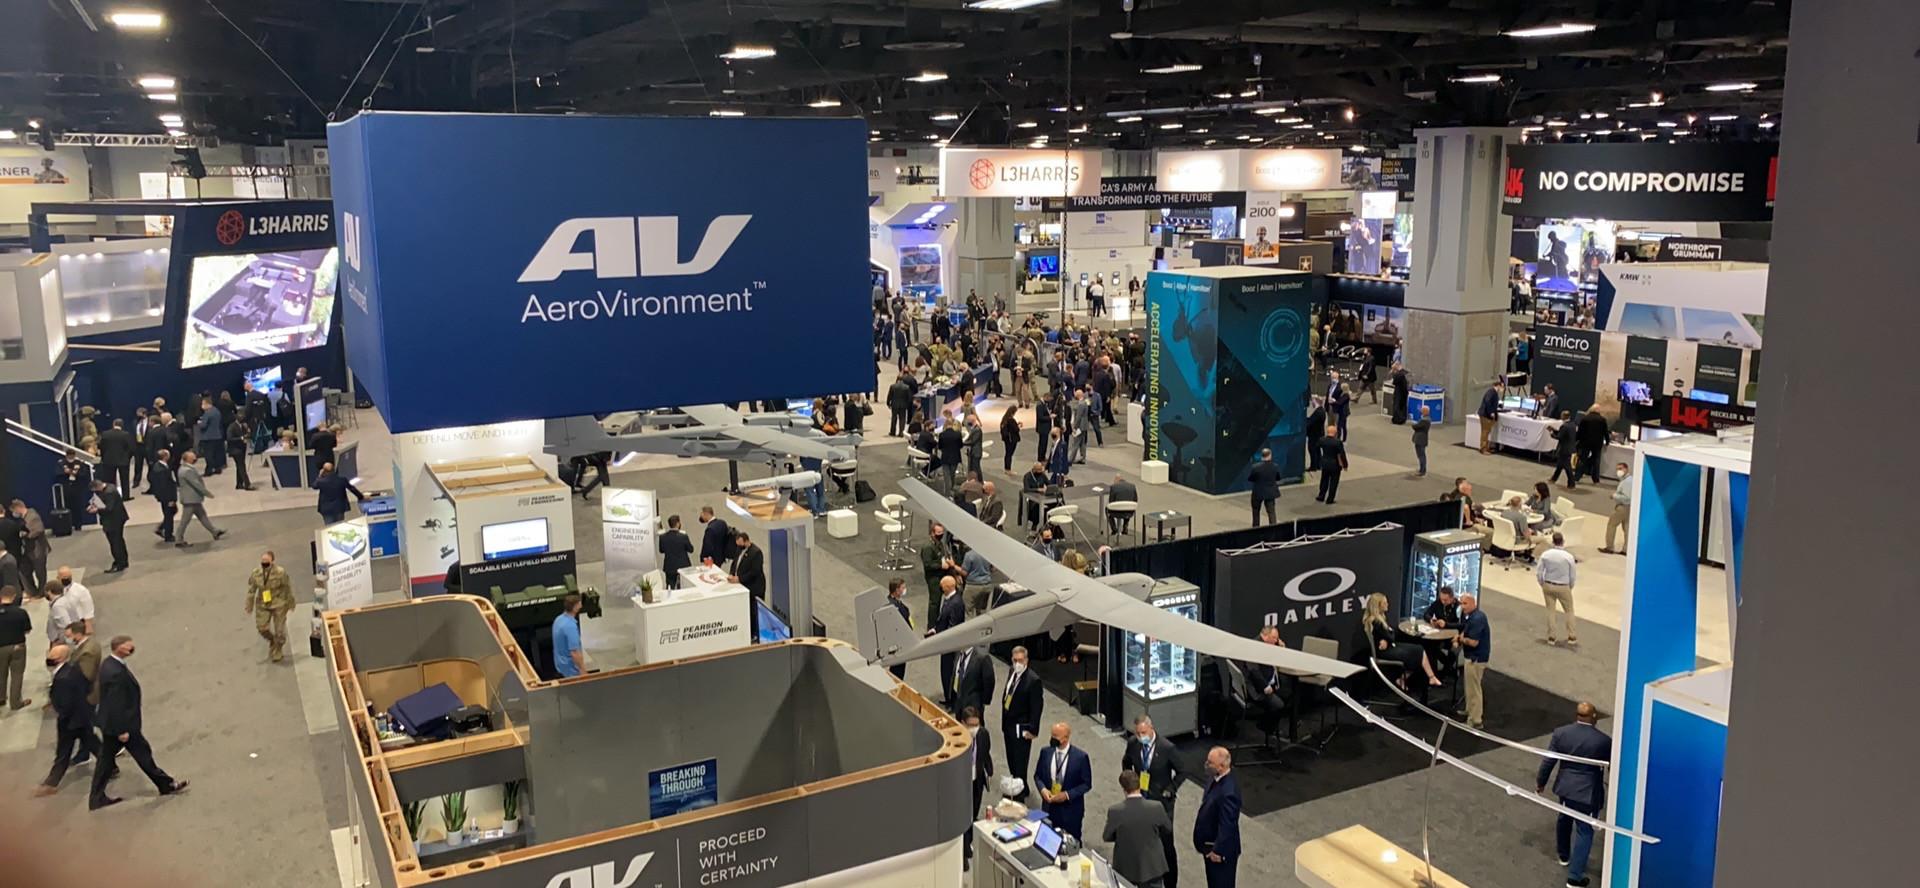 AUSA 2021 12 October 2021 AeroVironment